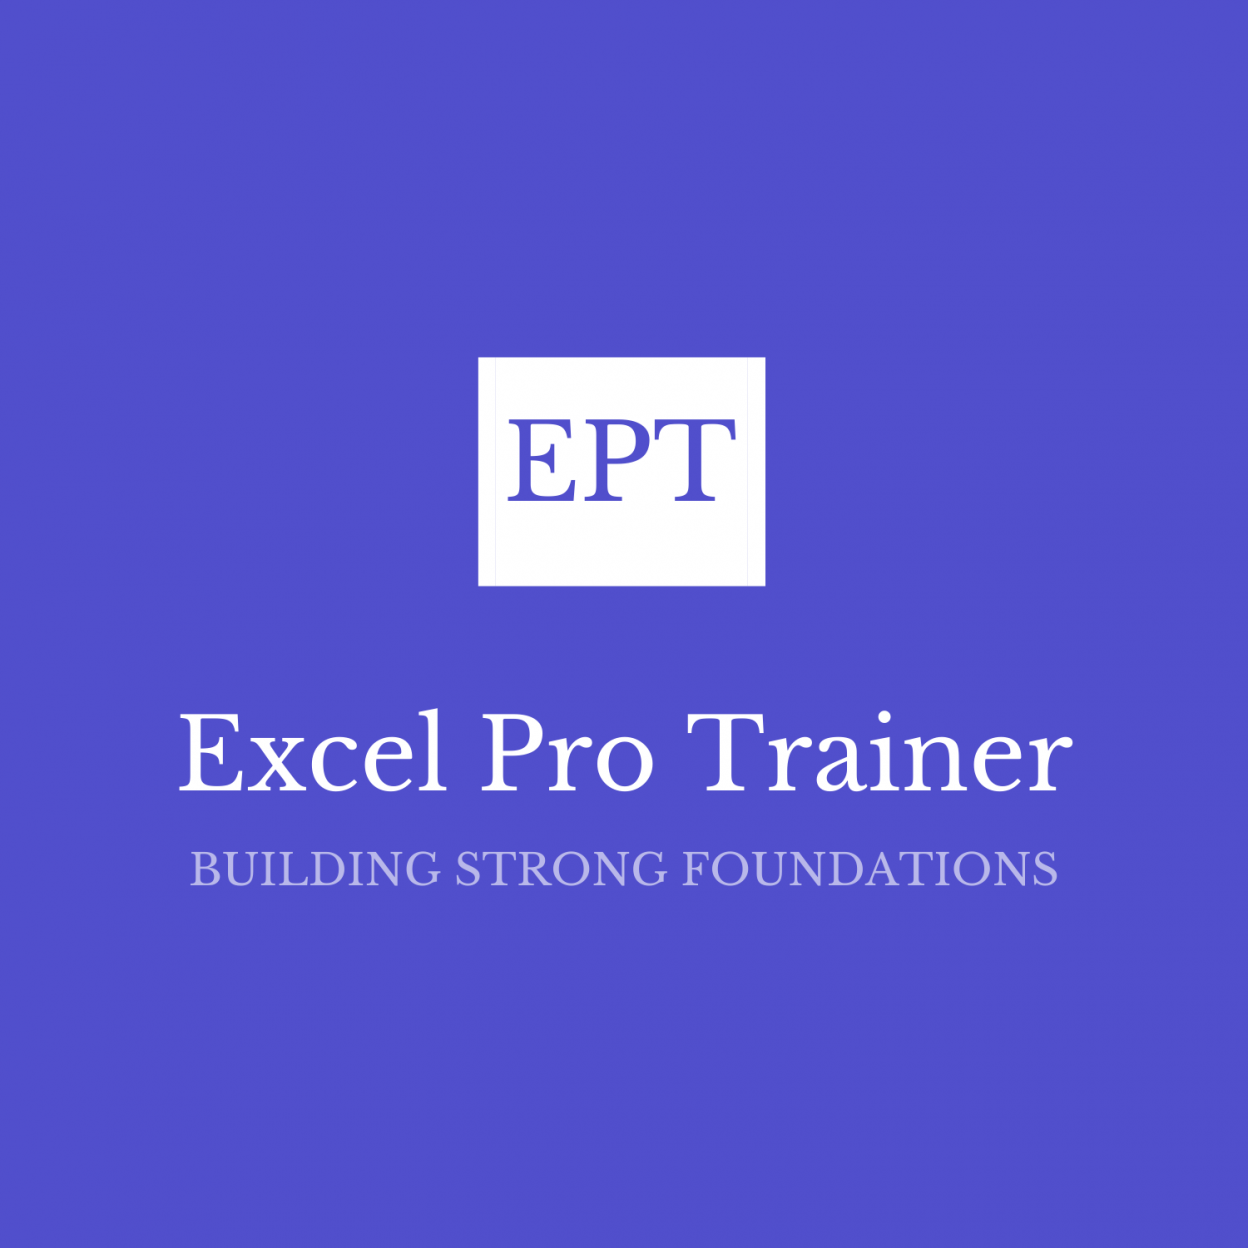 Excel Pro Trainer